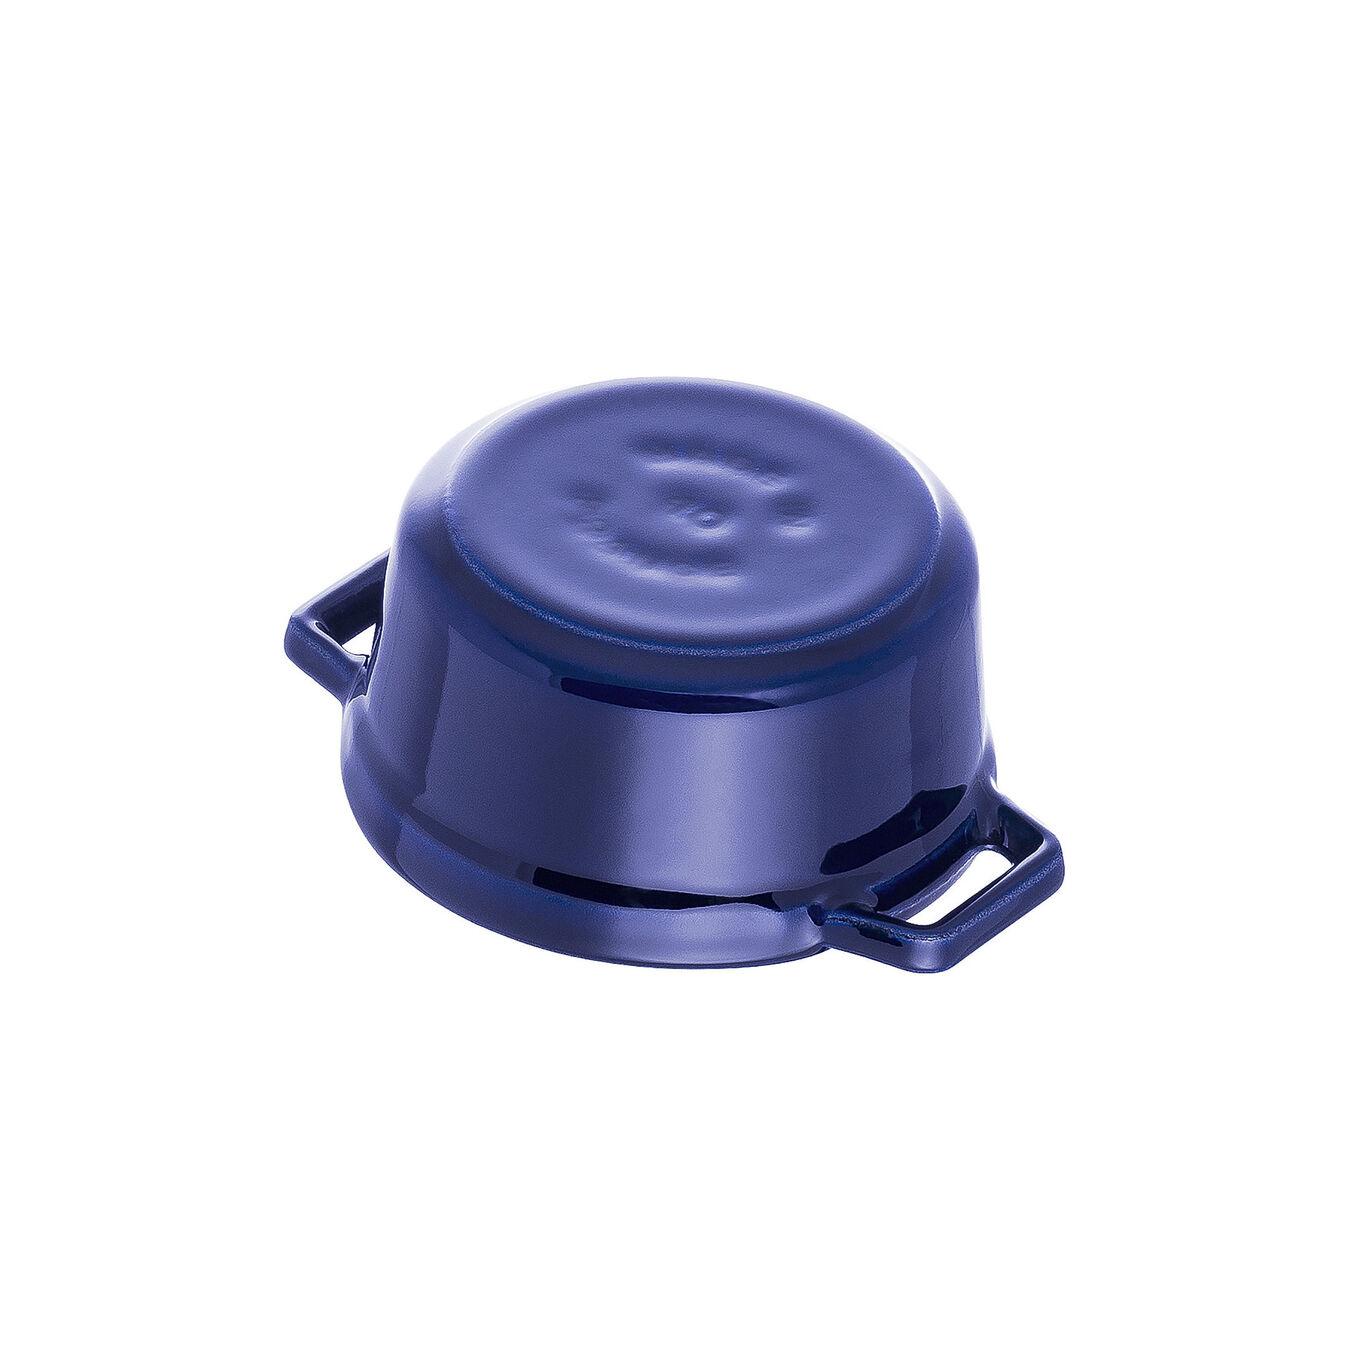 Mini Cocotte 10 cm, Rond(e), Bleu intense, Fonte,,large 3